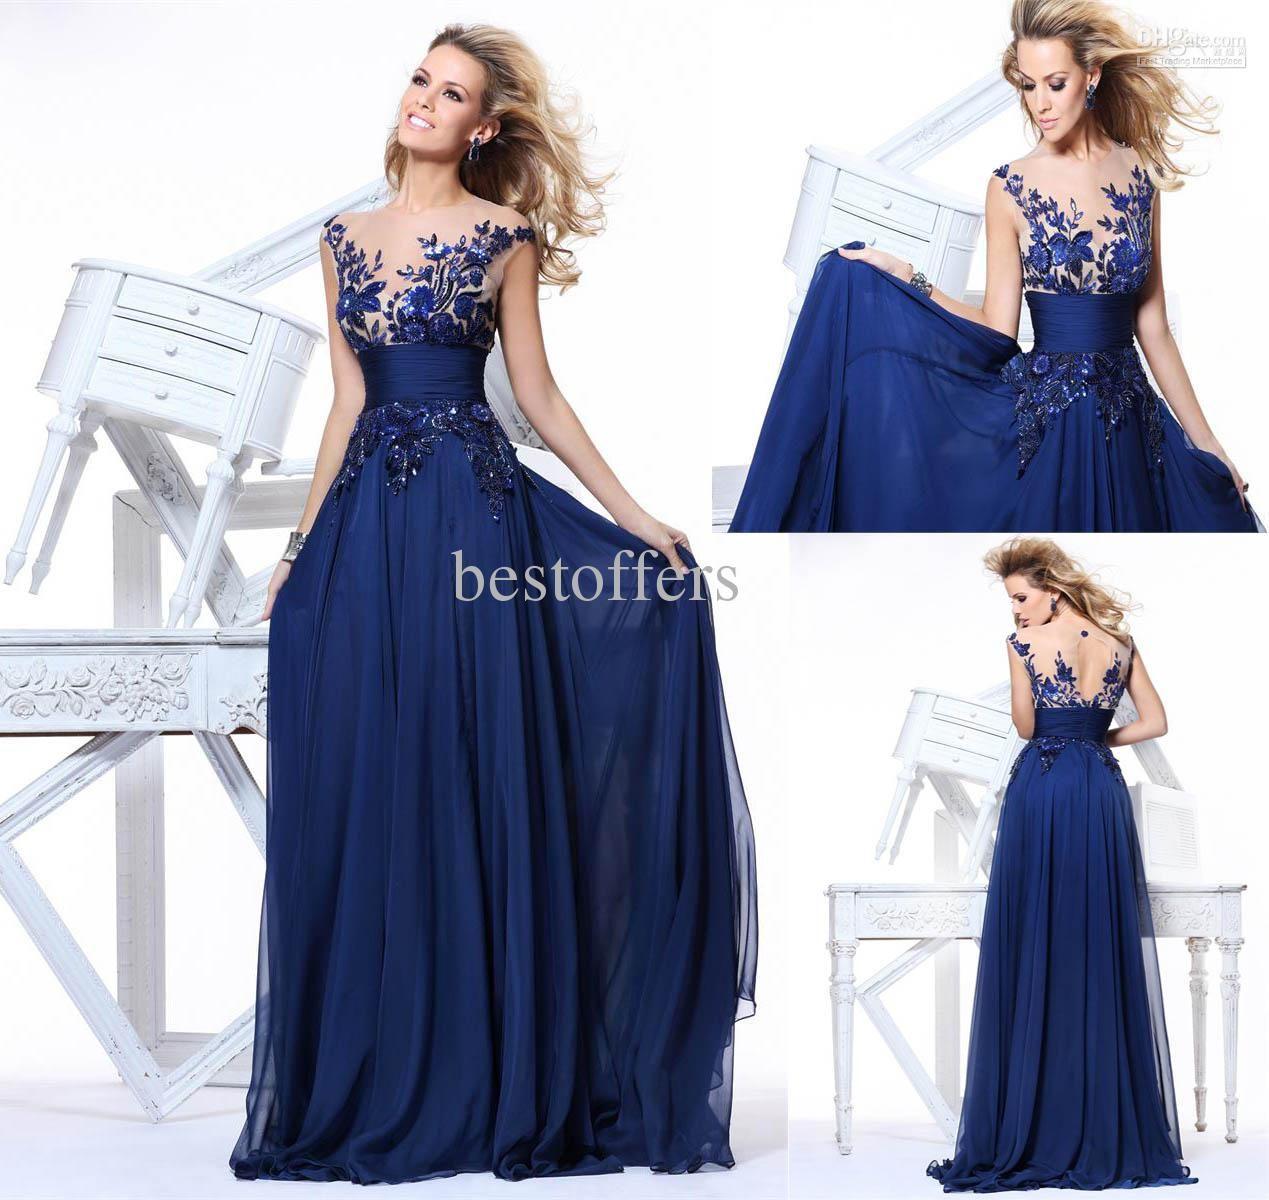 Blue 7 black dress on sale